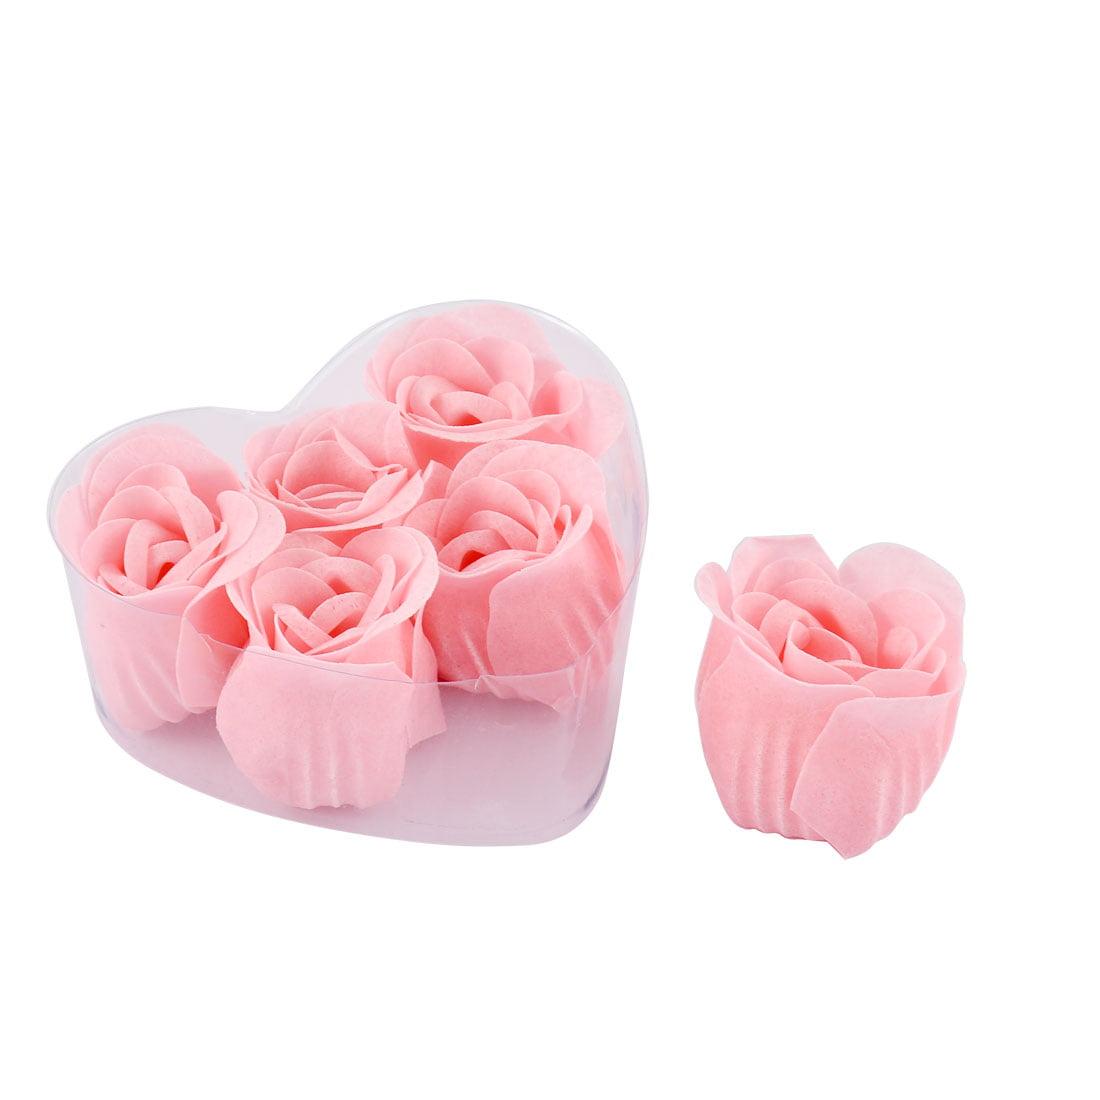 6pcs Decorative Body Relax Clean Rose Petal Soap in Heart Shape Box Pink